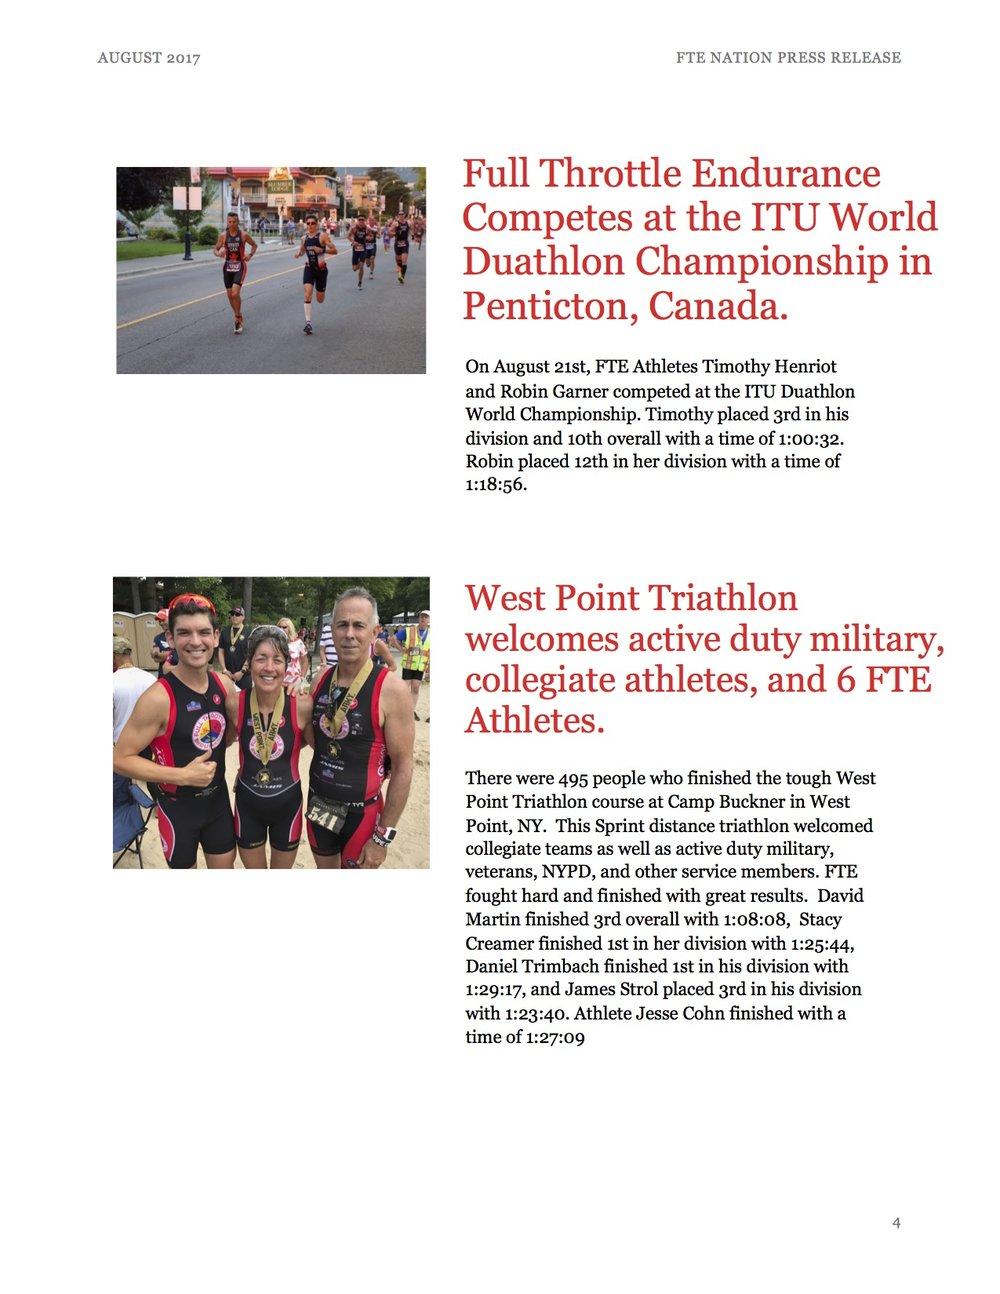 August 2017 Press Release 4.jpg